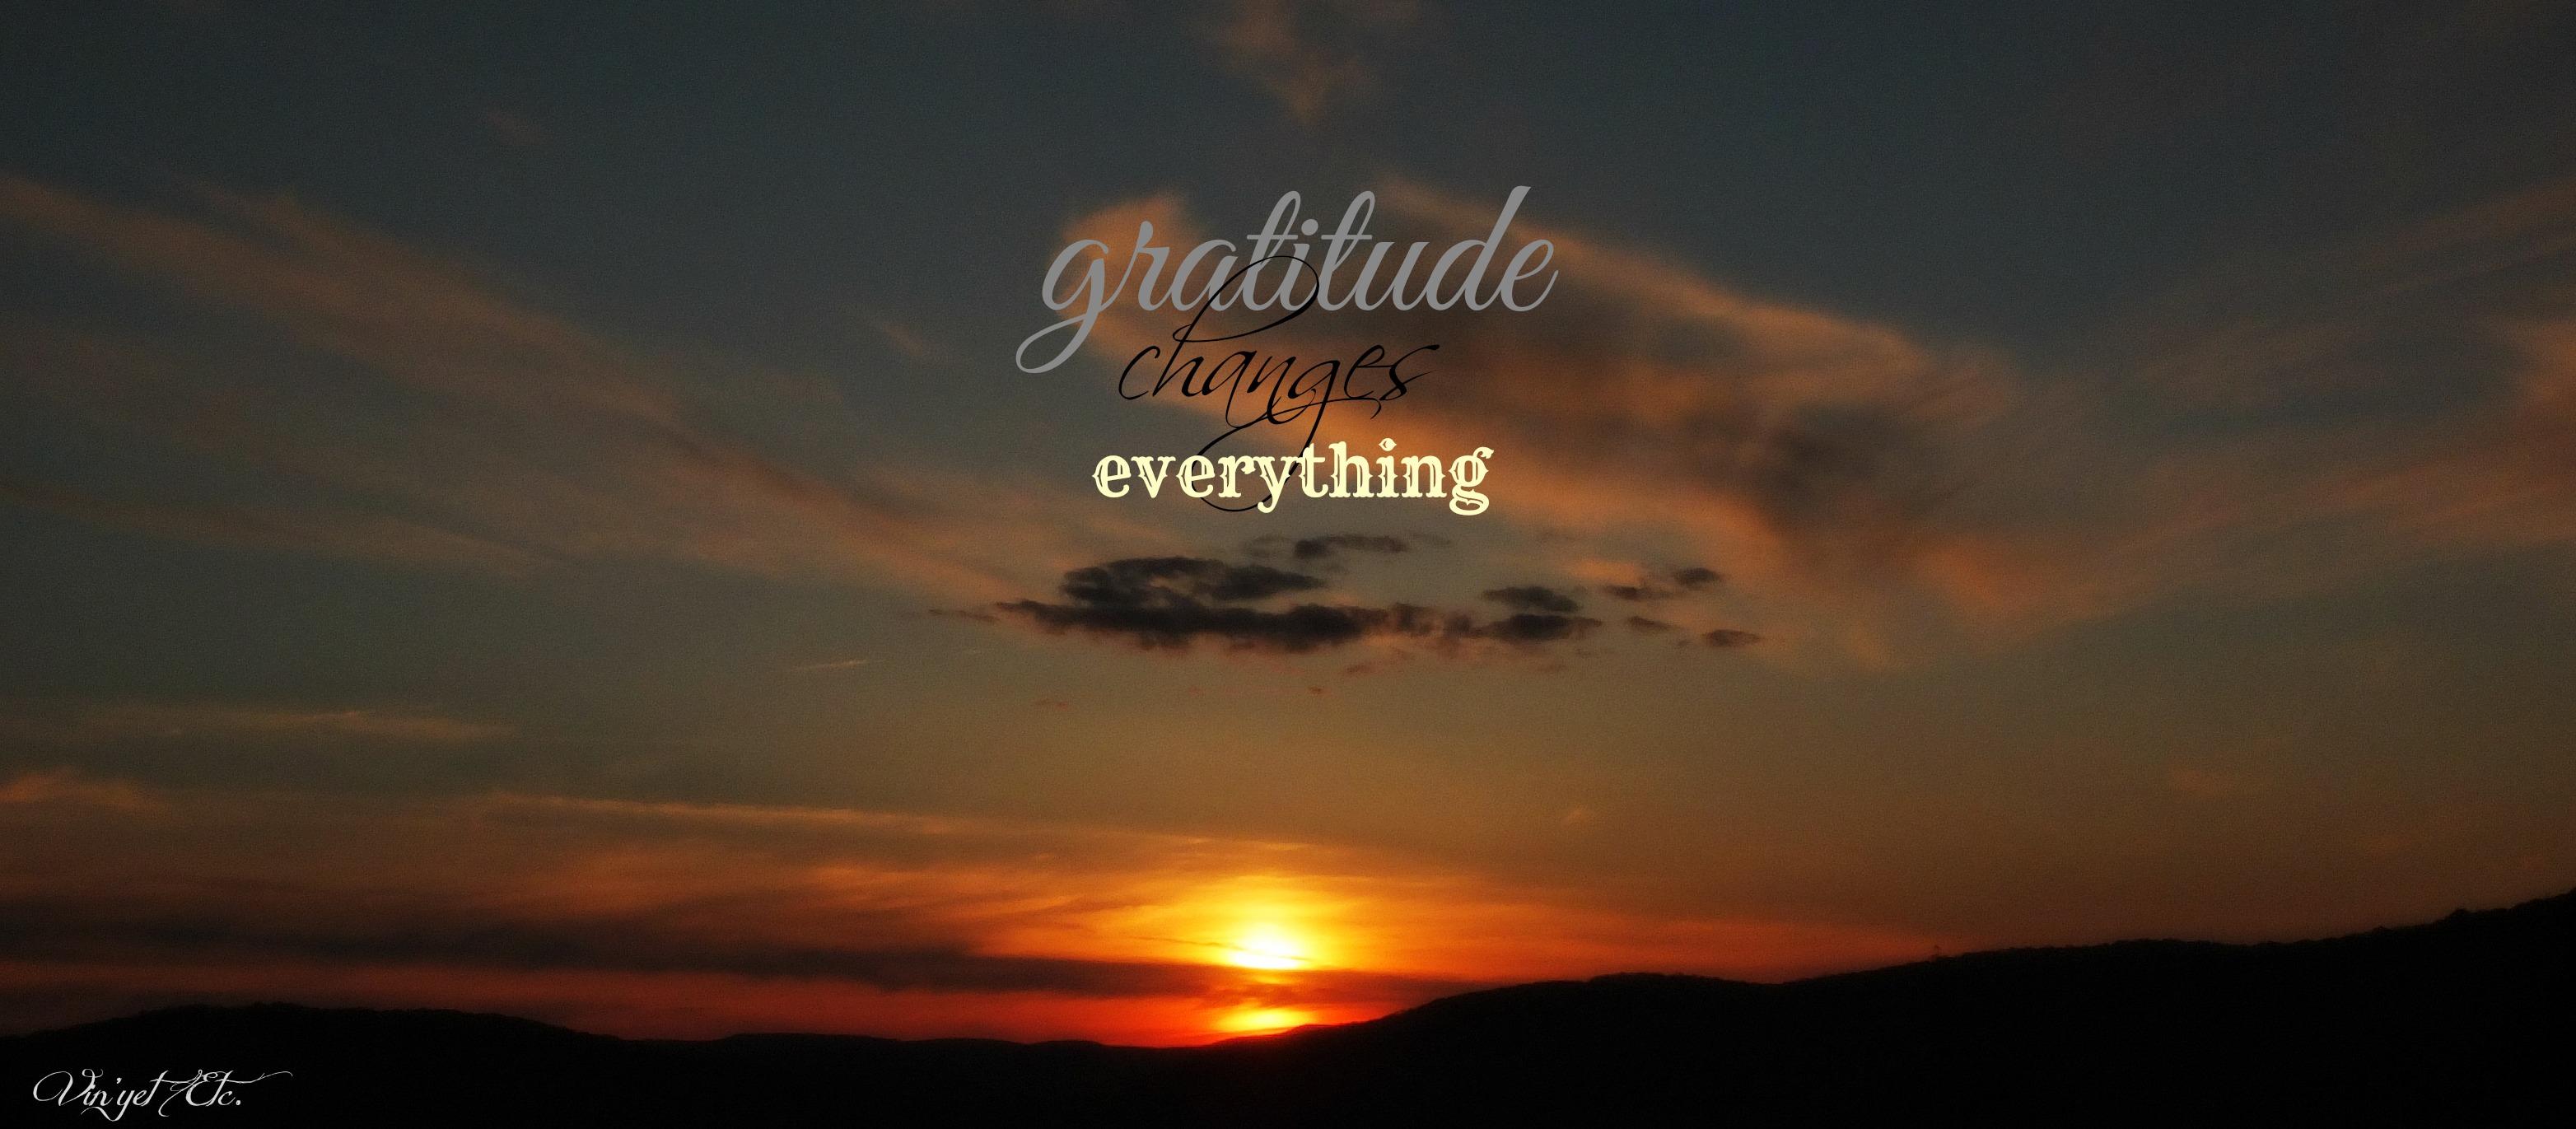 Gratitude Vin Yet Etc Vin Yet Etc